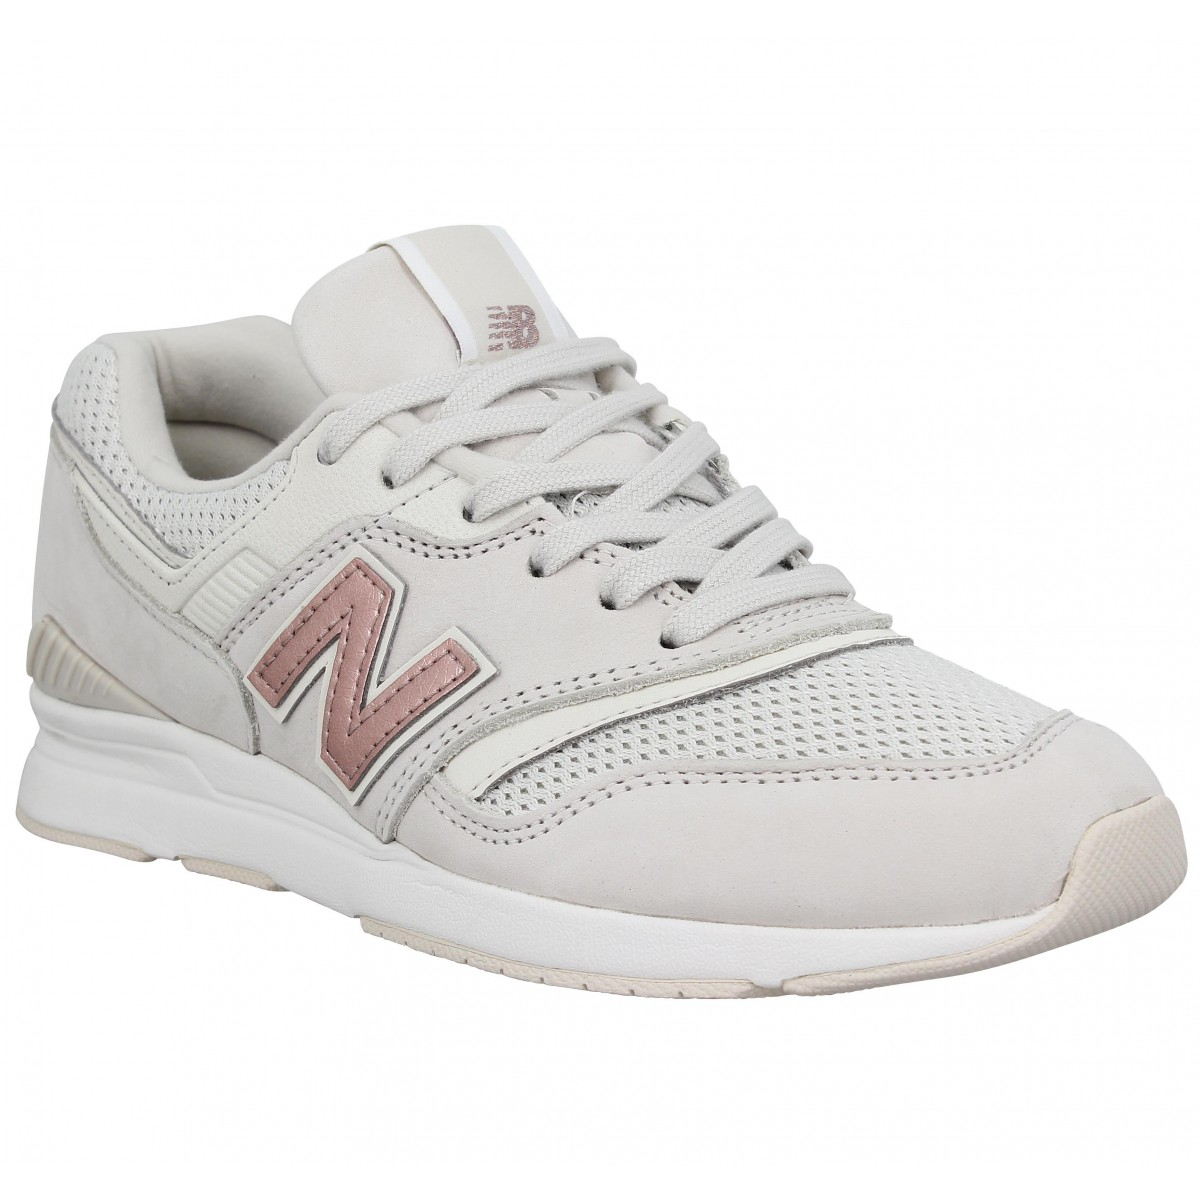 New Balance Marque 697 Nubuck...